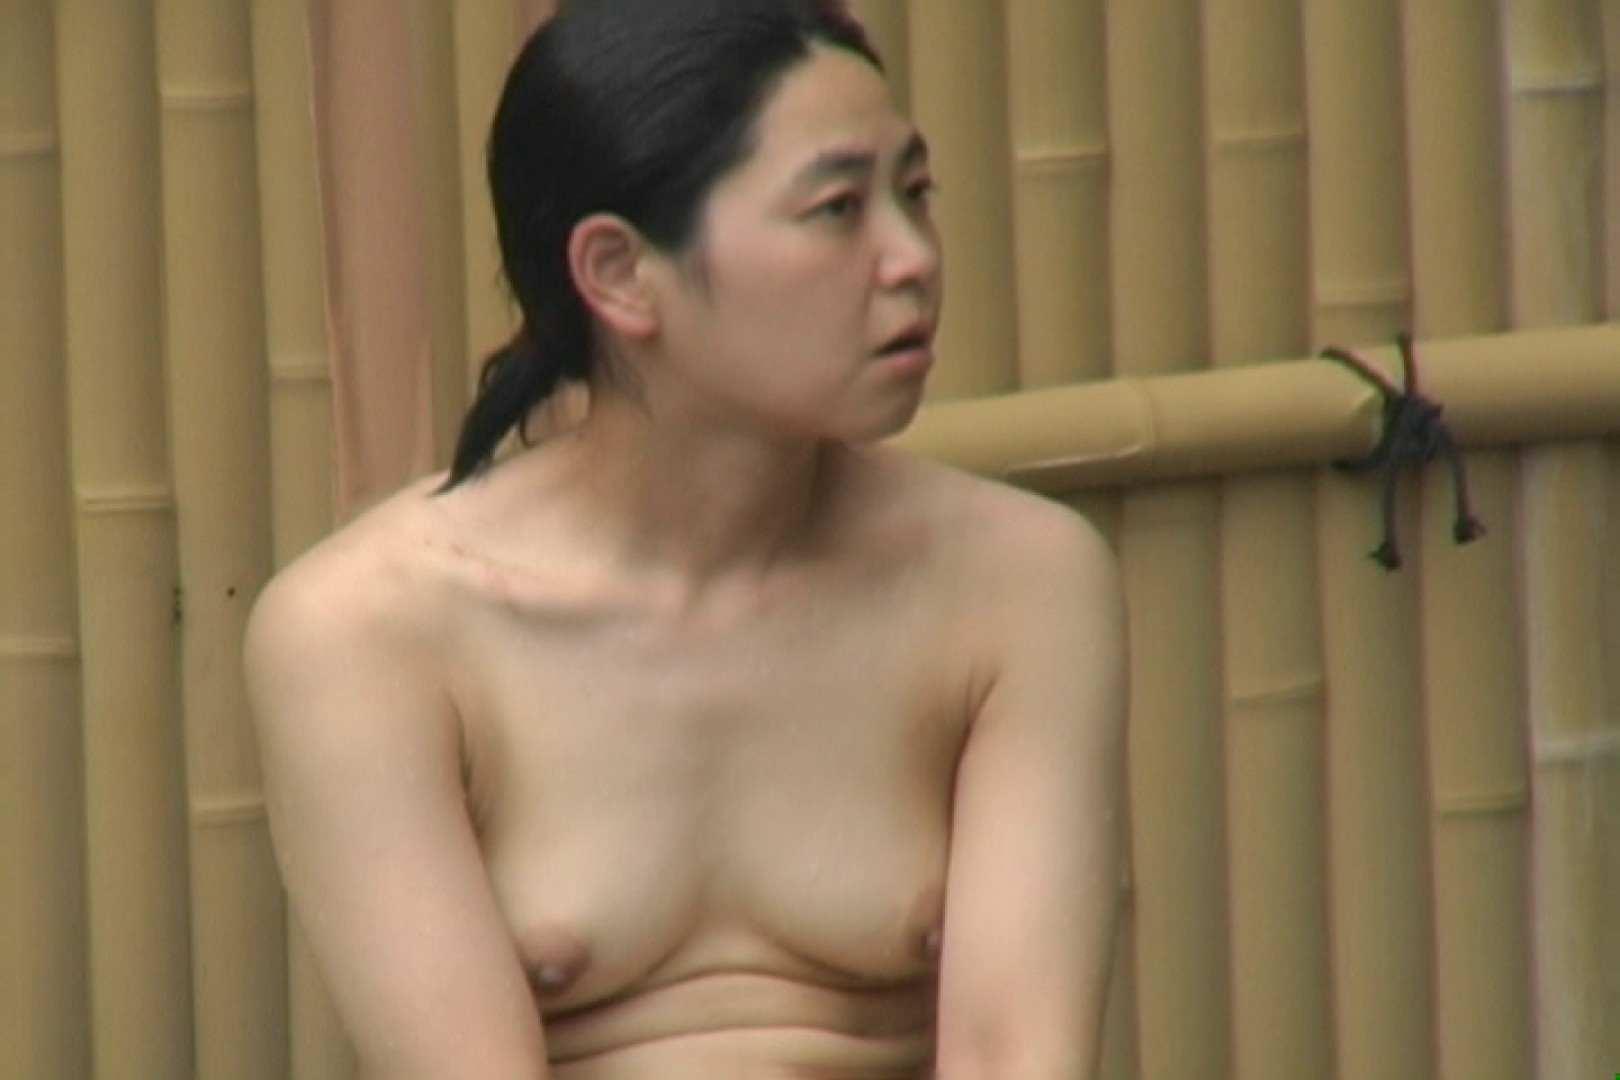 Aquaな露天風呂Vol.623 盗撮 SEX無修正画像 97画像 35